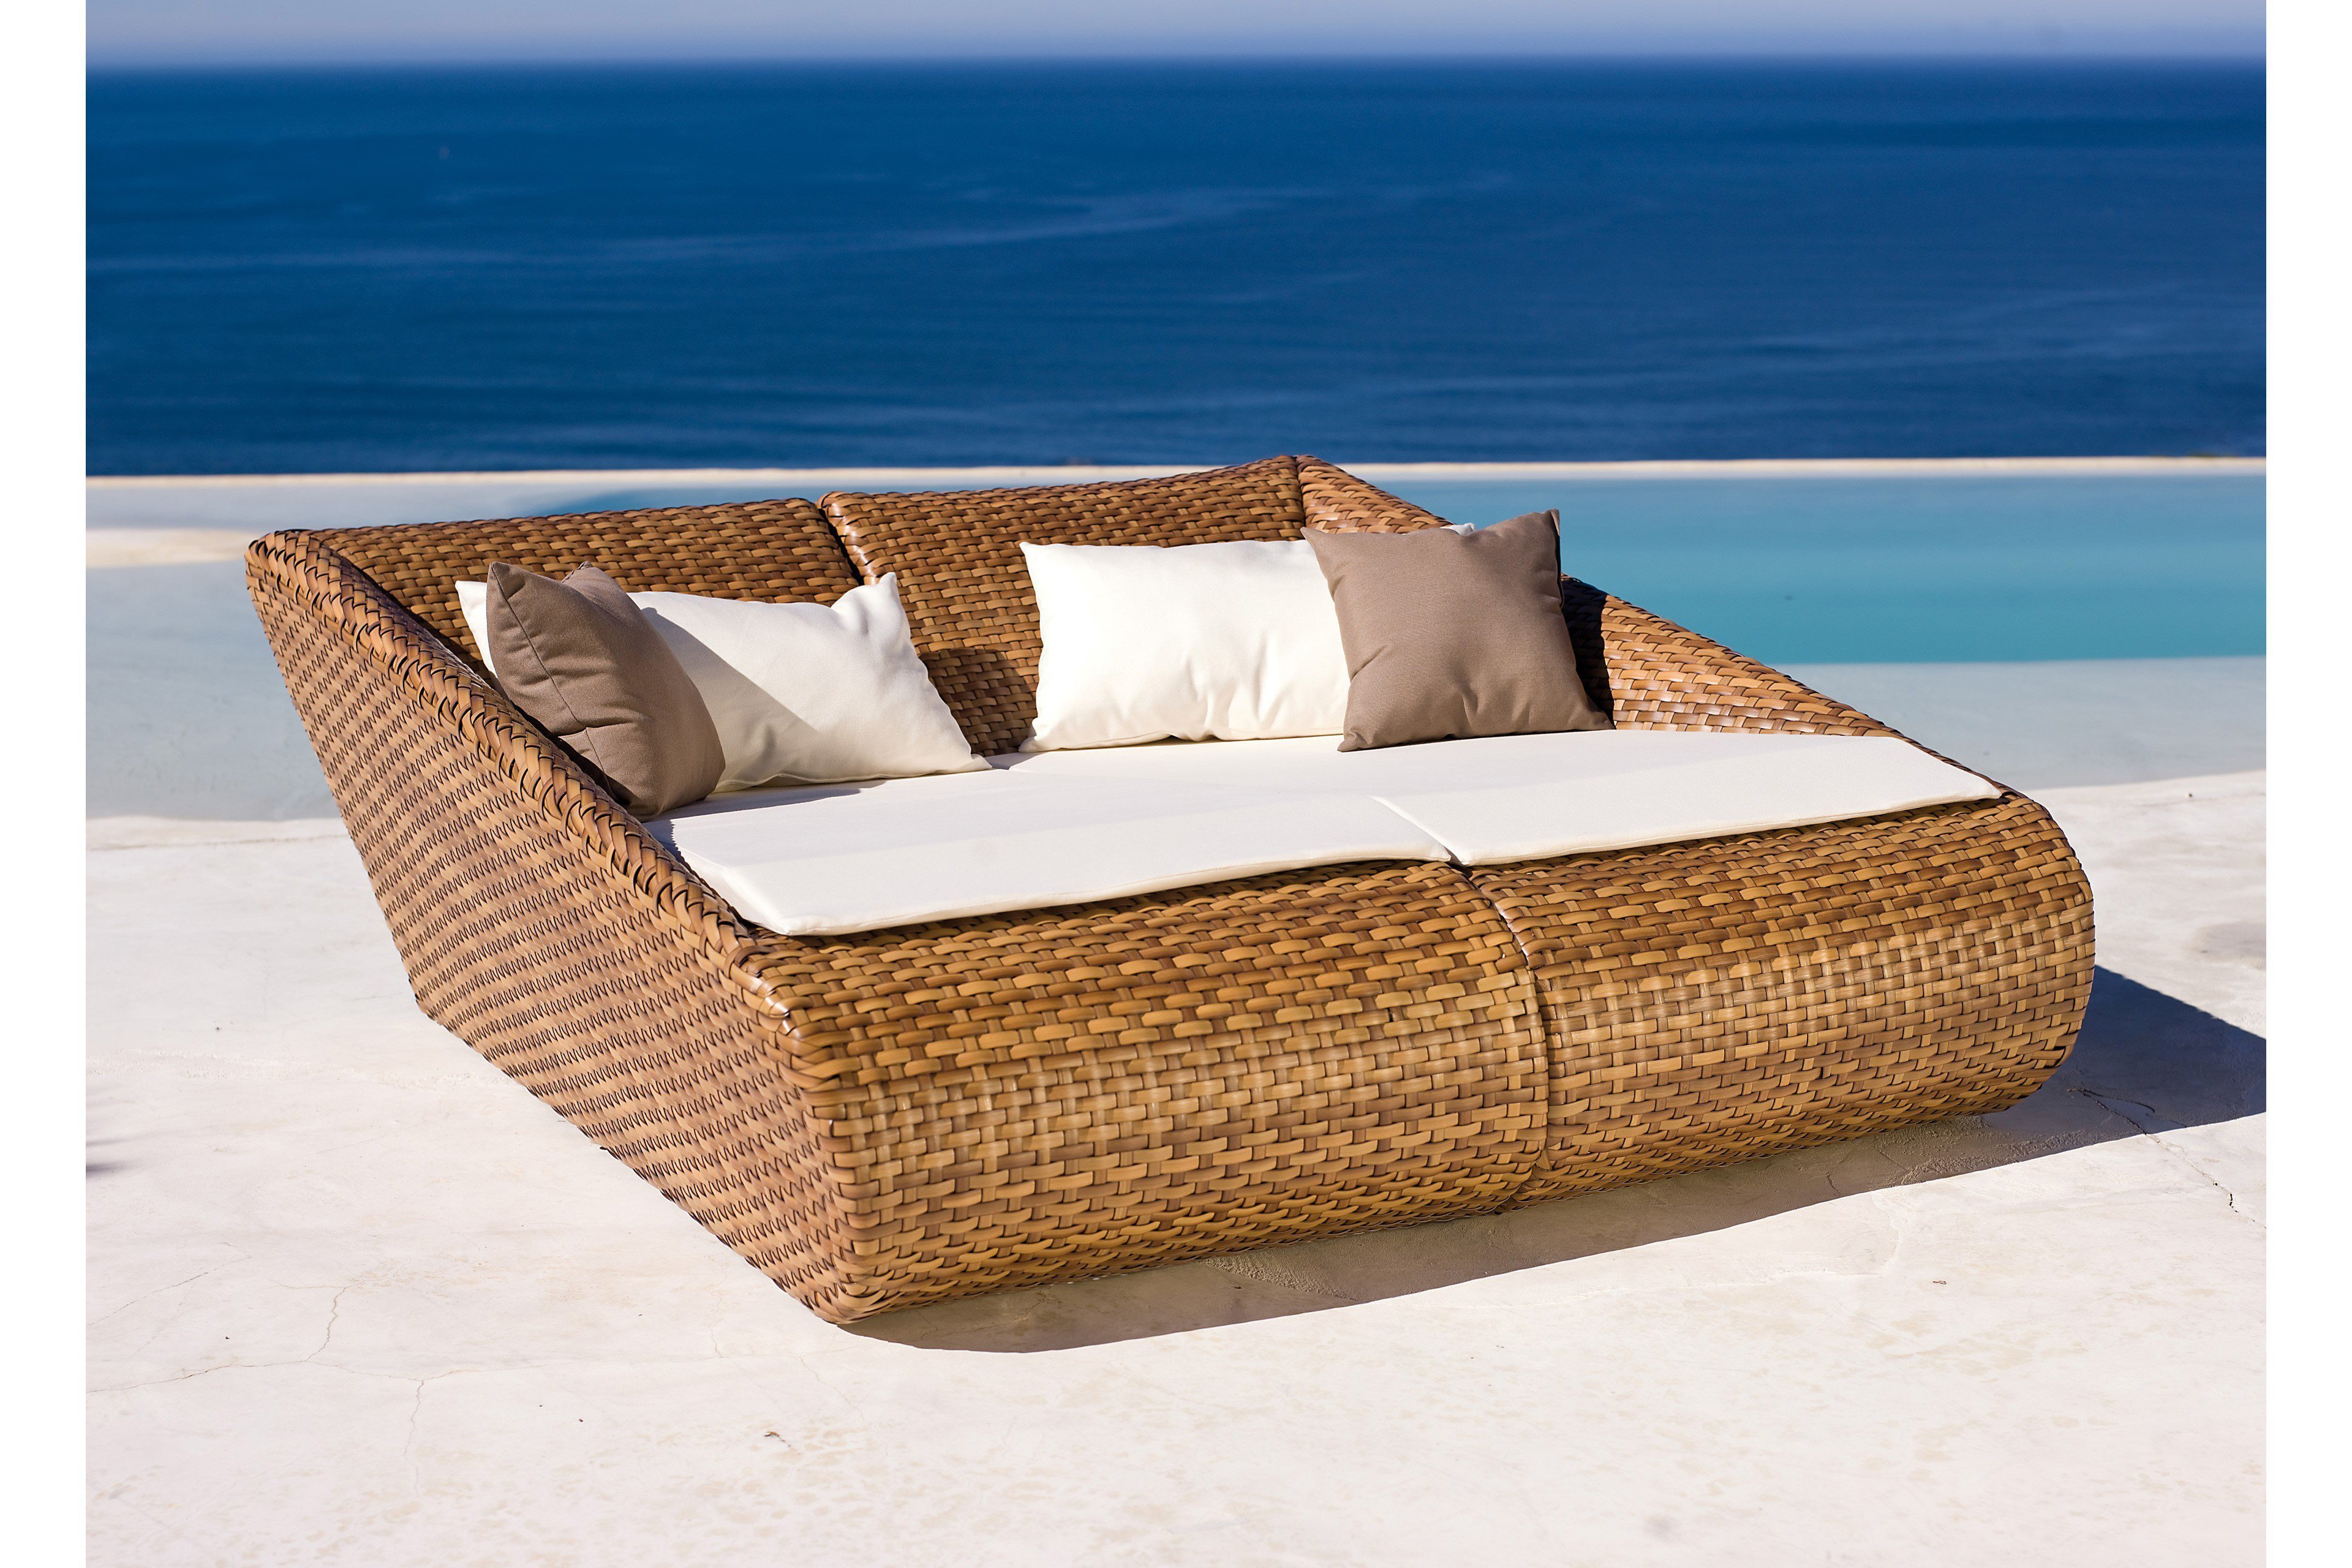 mbm living doppelliege relax lounge geflecht tobacco. Black Bedroom Furniture Sets. Home Design Ideas